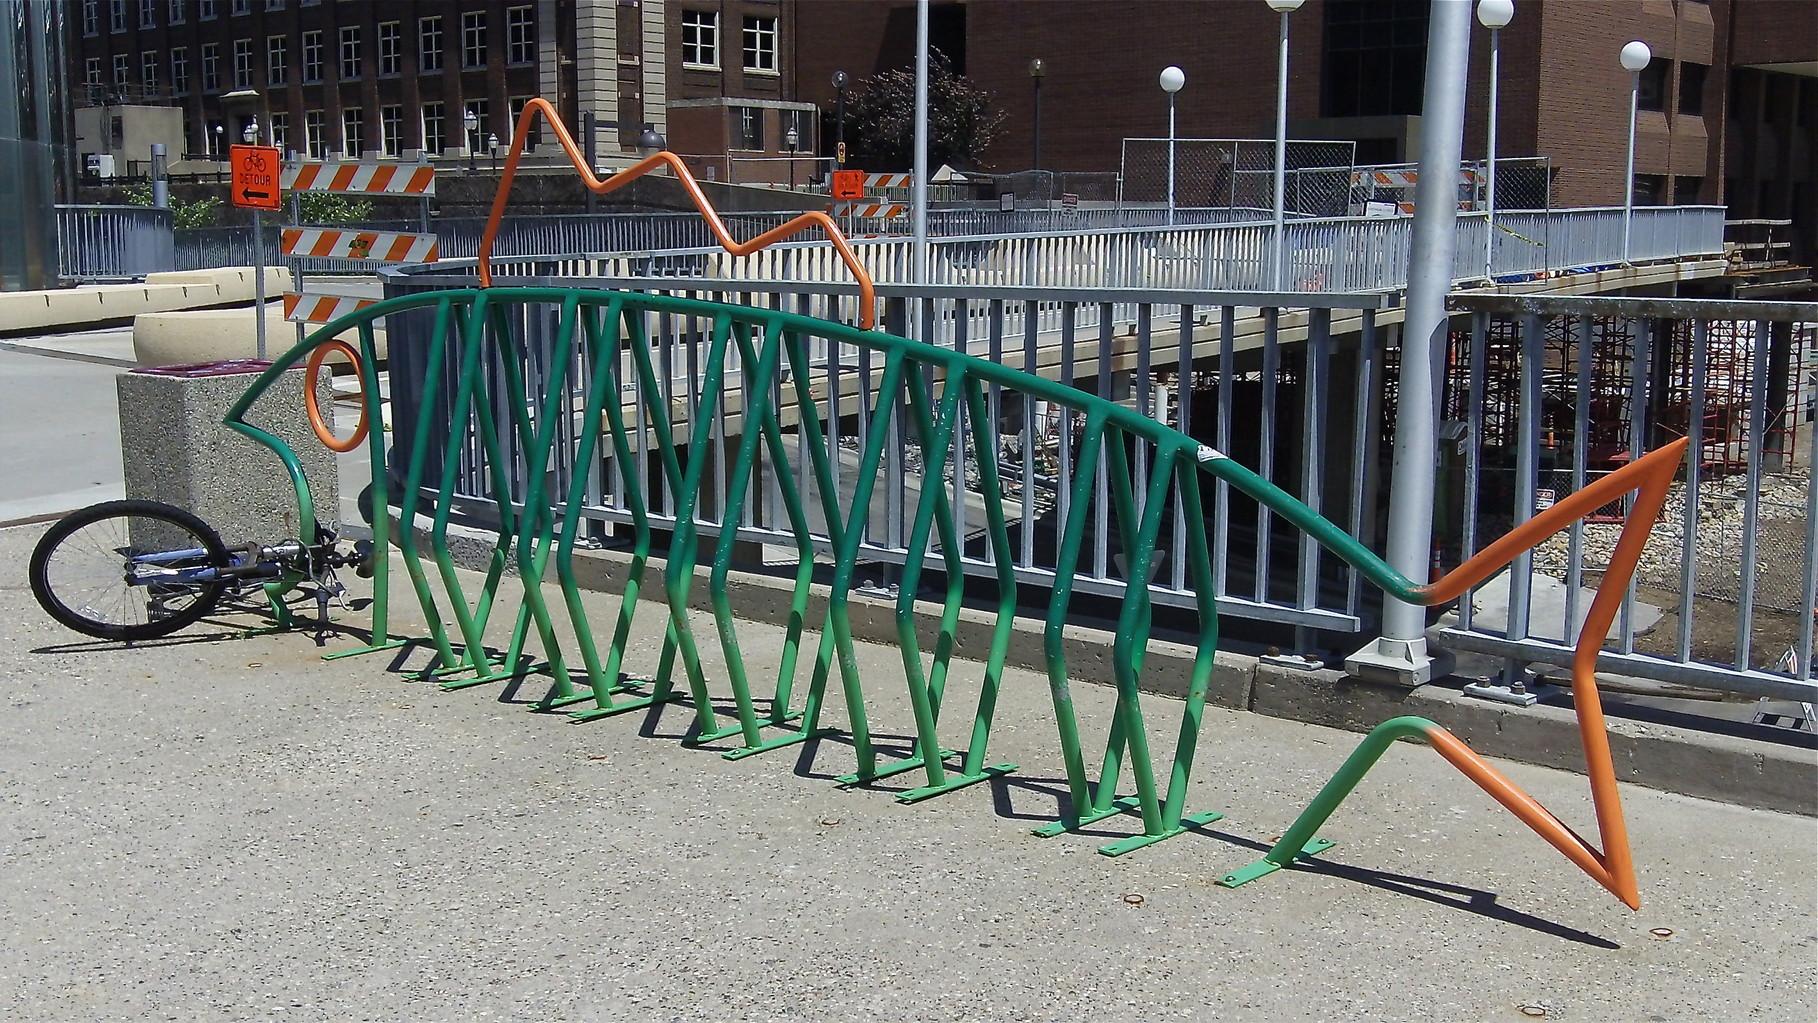 Bike rack on the campus.